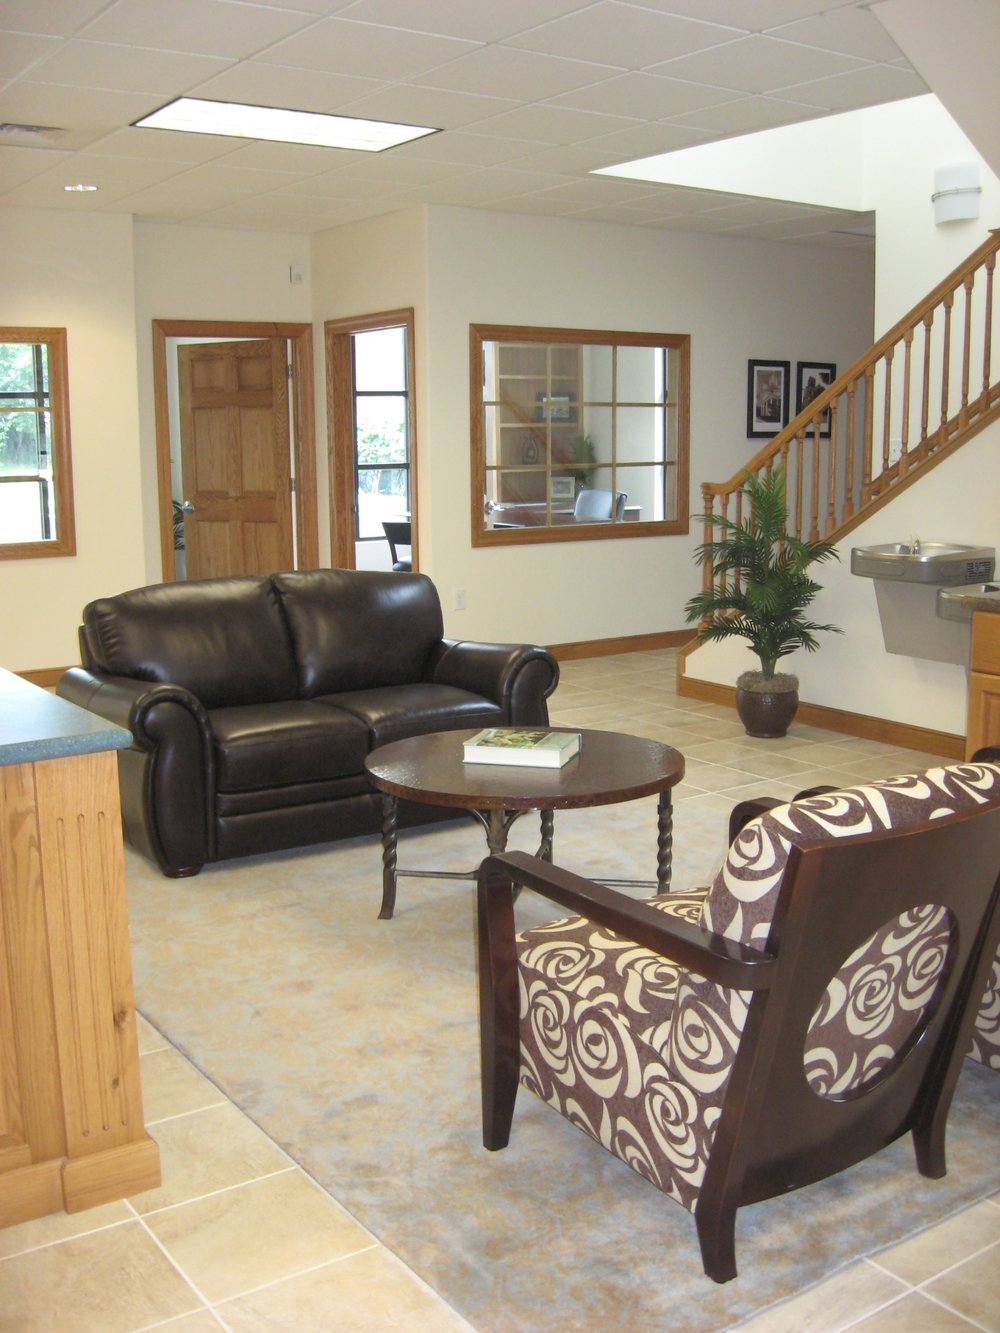 furnished interior (5).jpg